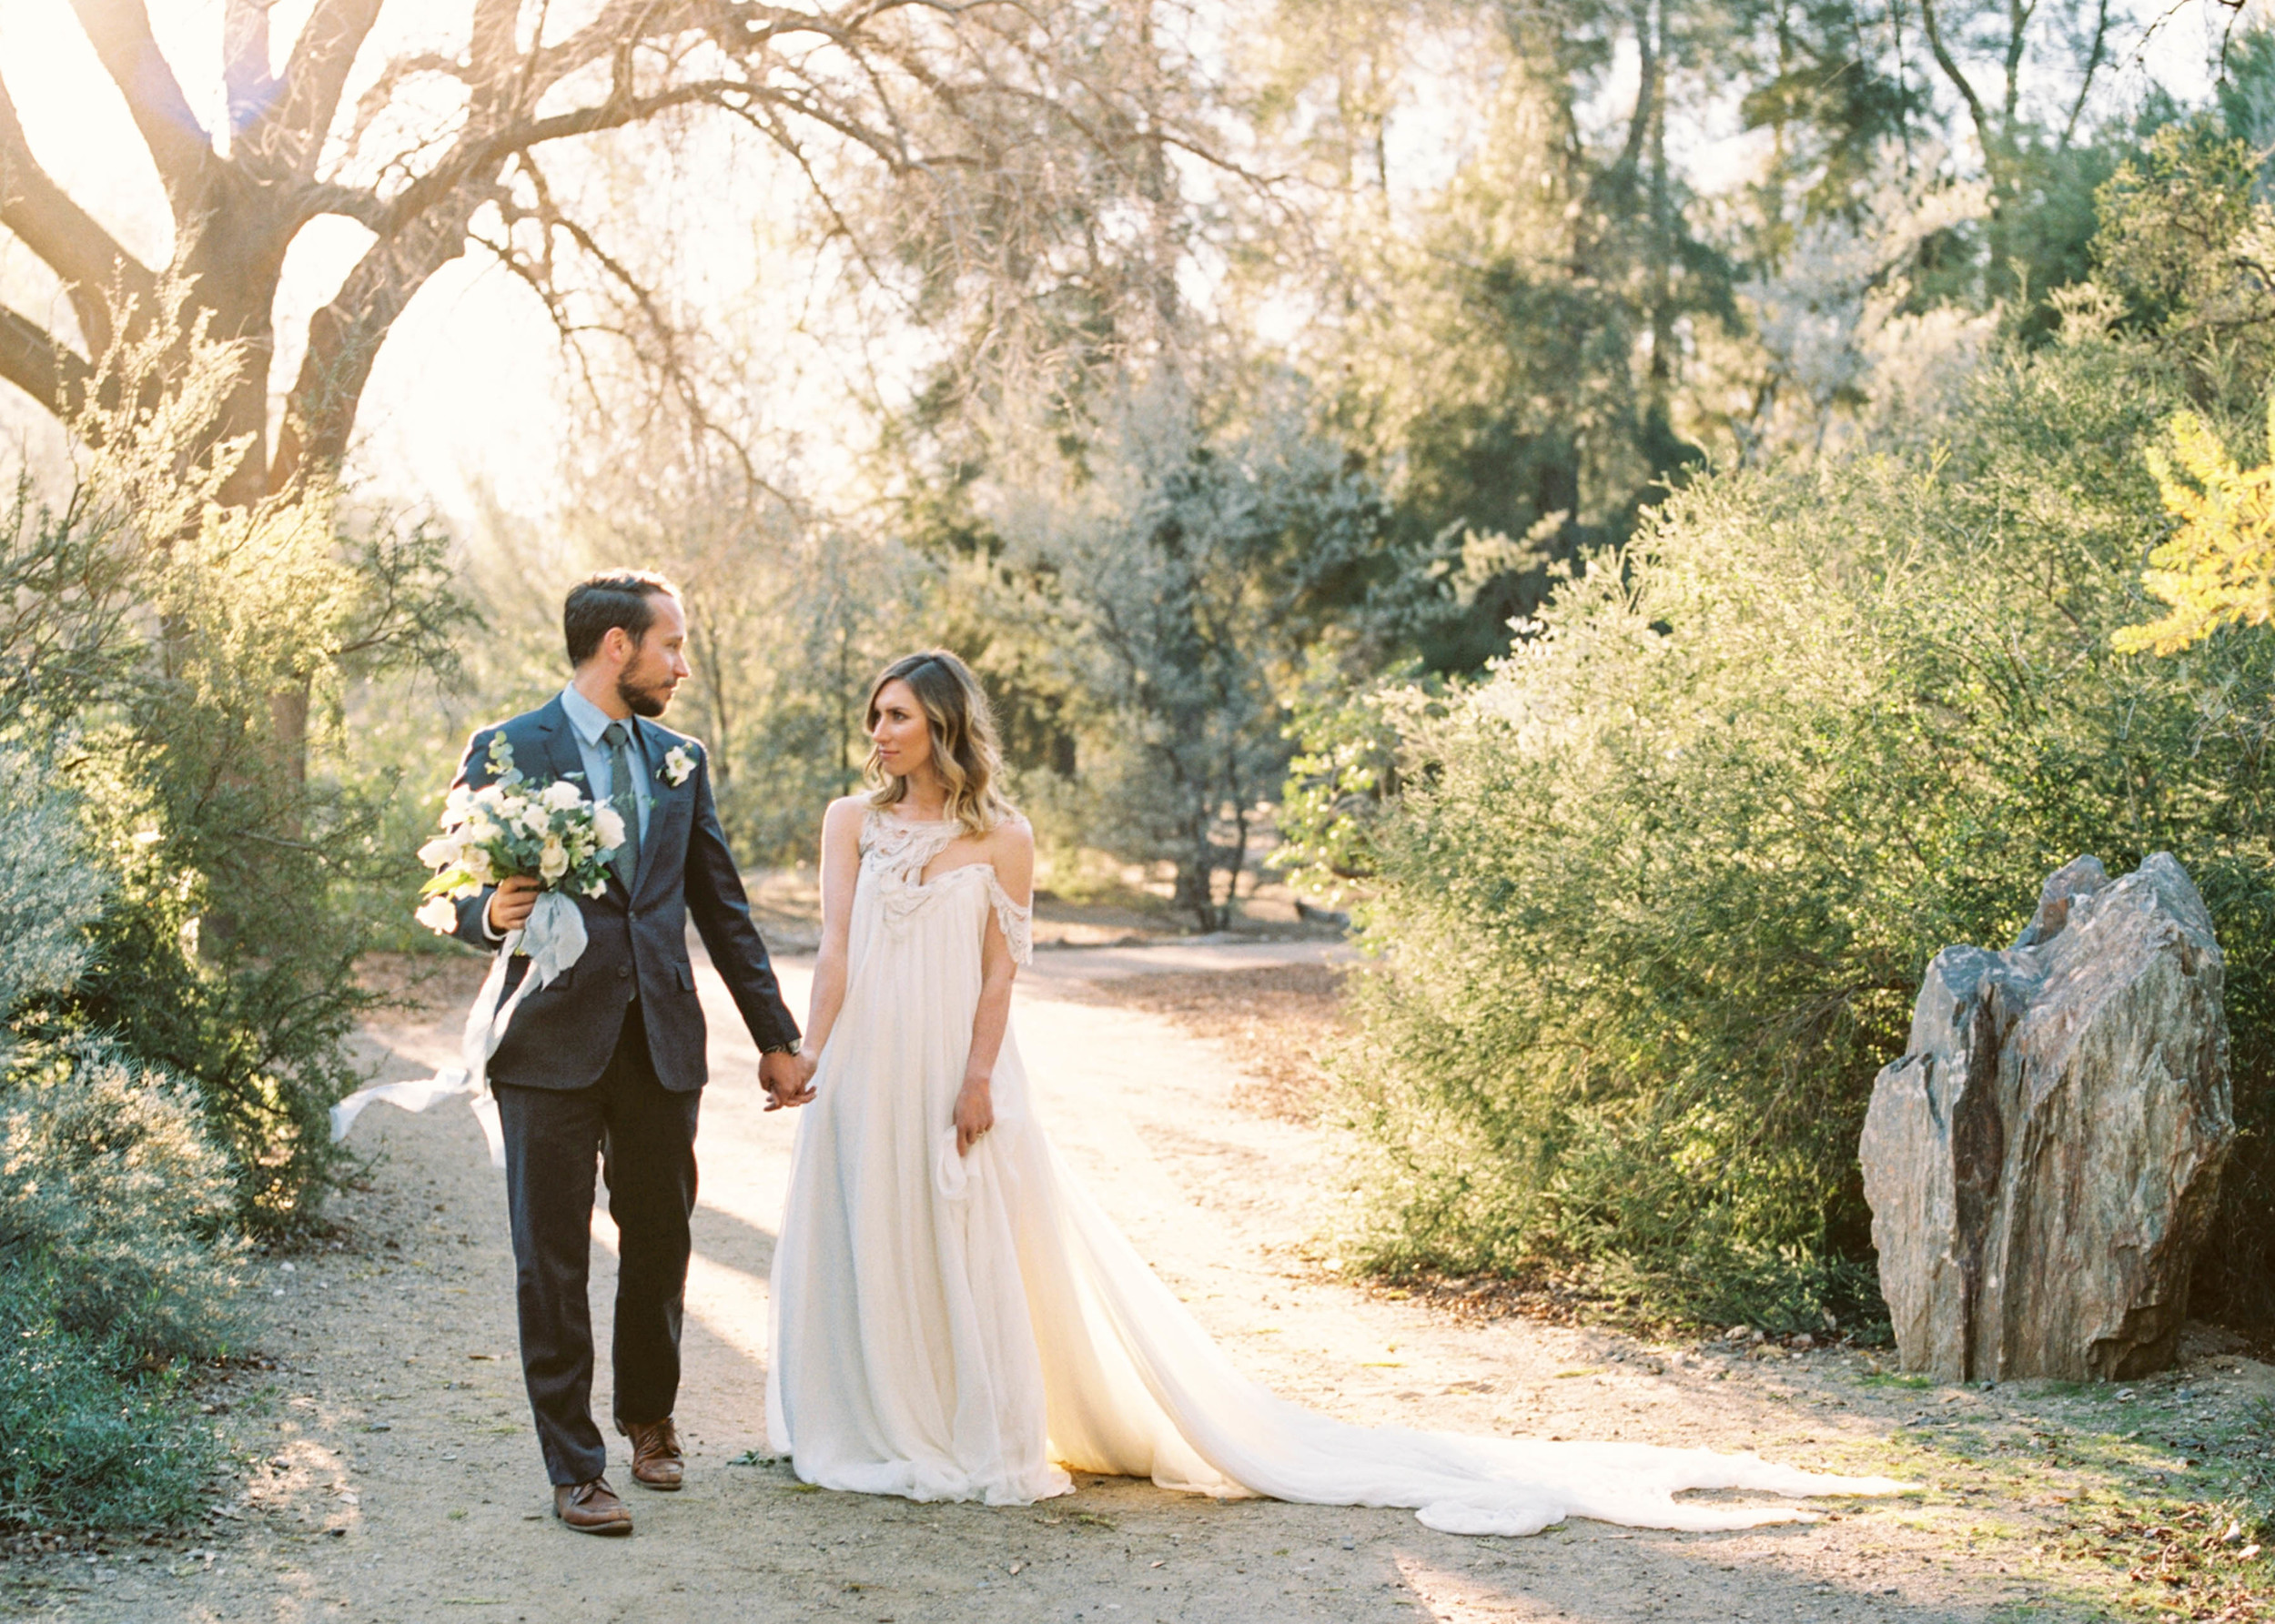 Danford-Photography-Bozeman-Big Sky-Glacier-Fine Art Film-Wedding-Engagement-Photographers-02.jpg